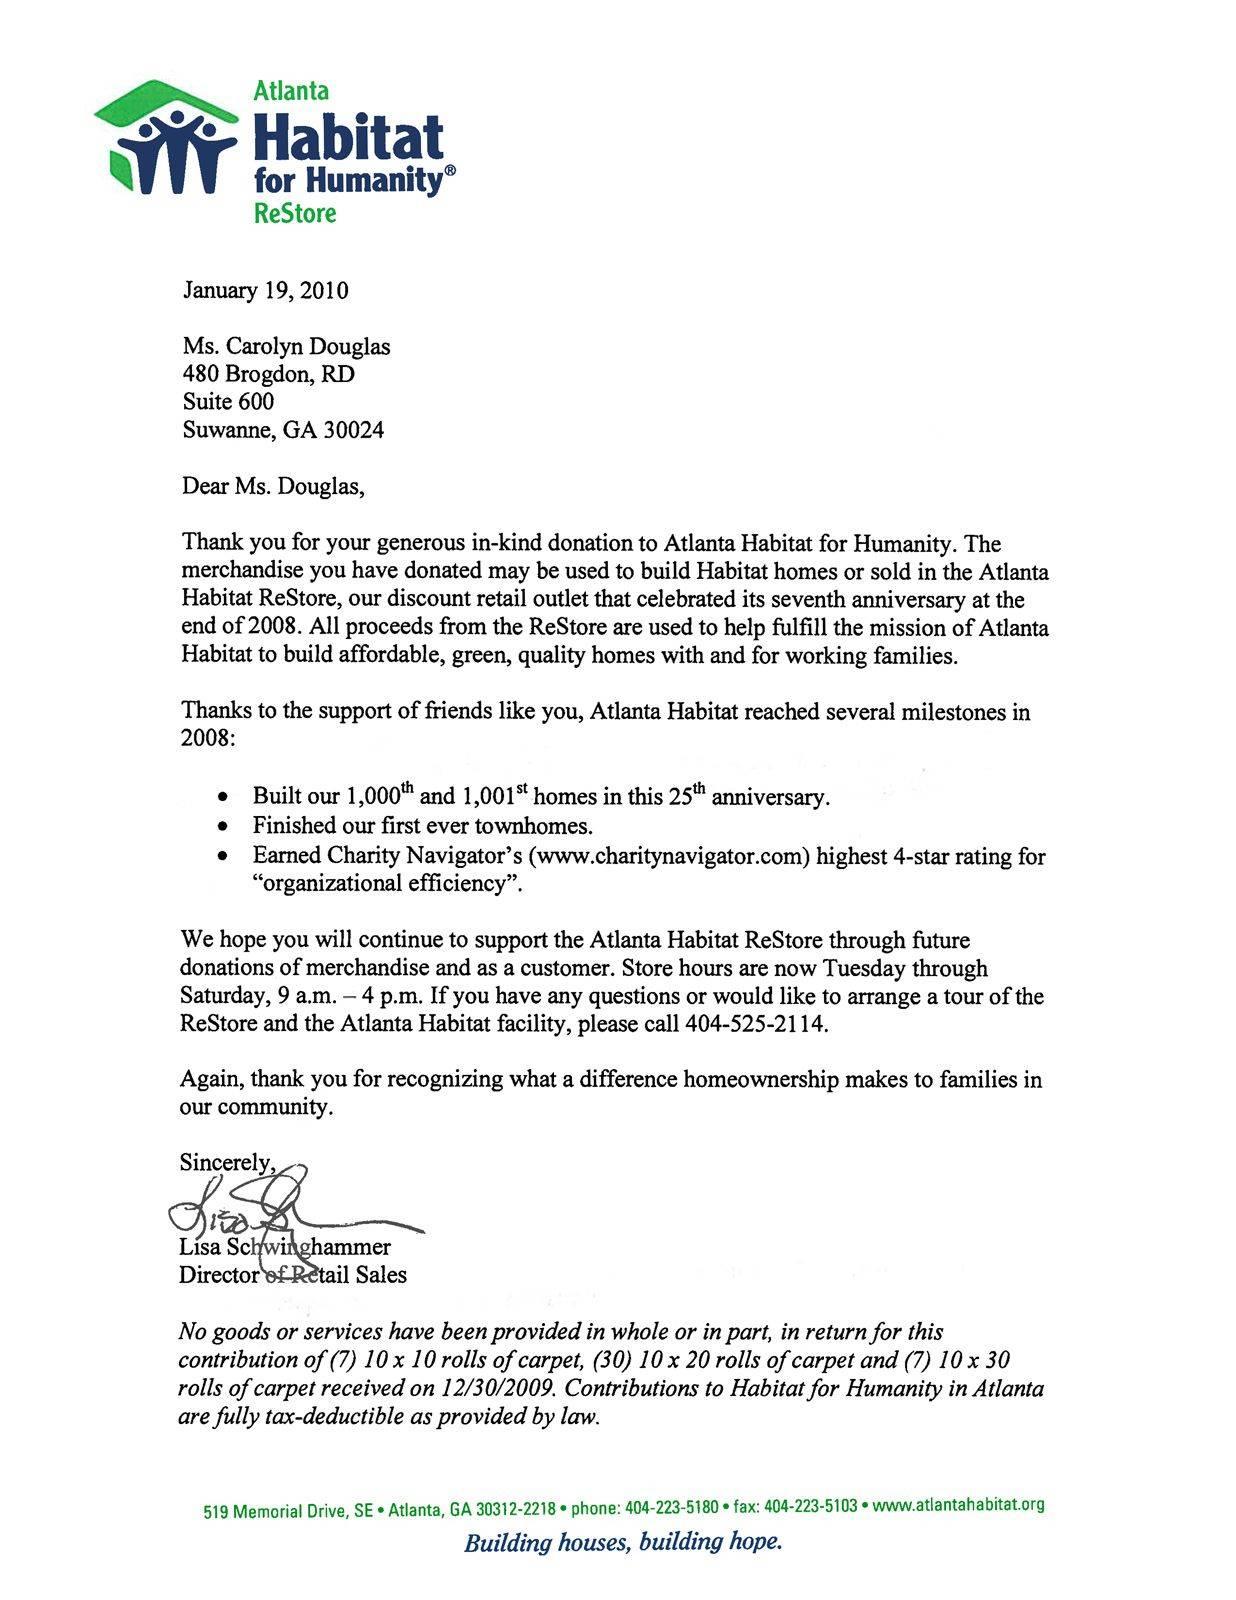 Sample Donation Letter Template